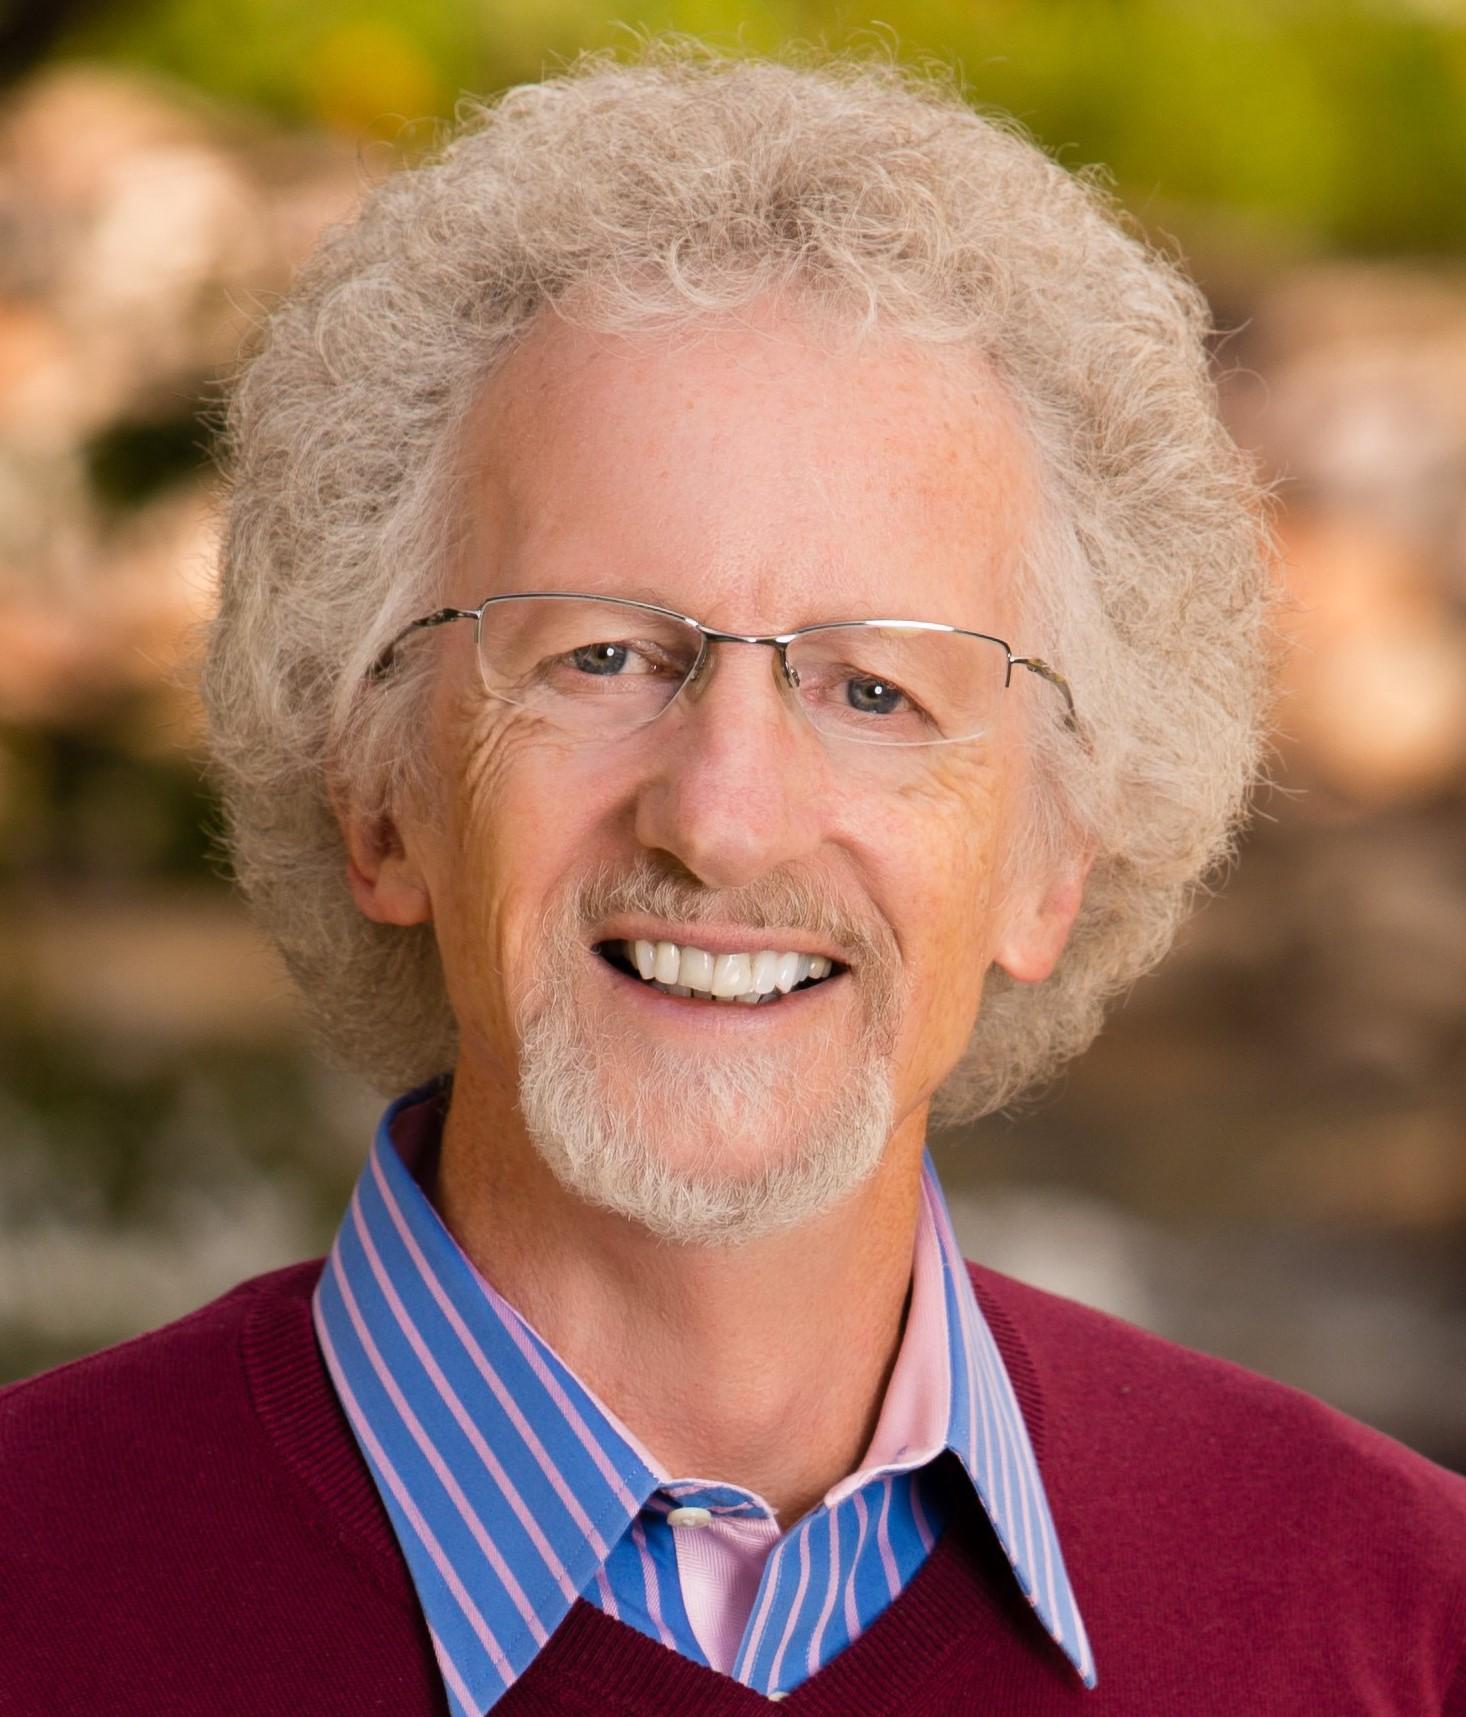 Philip Yancey, Award-Winning Author